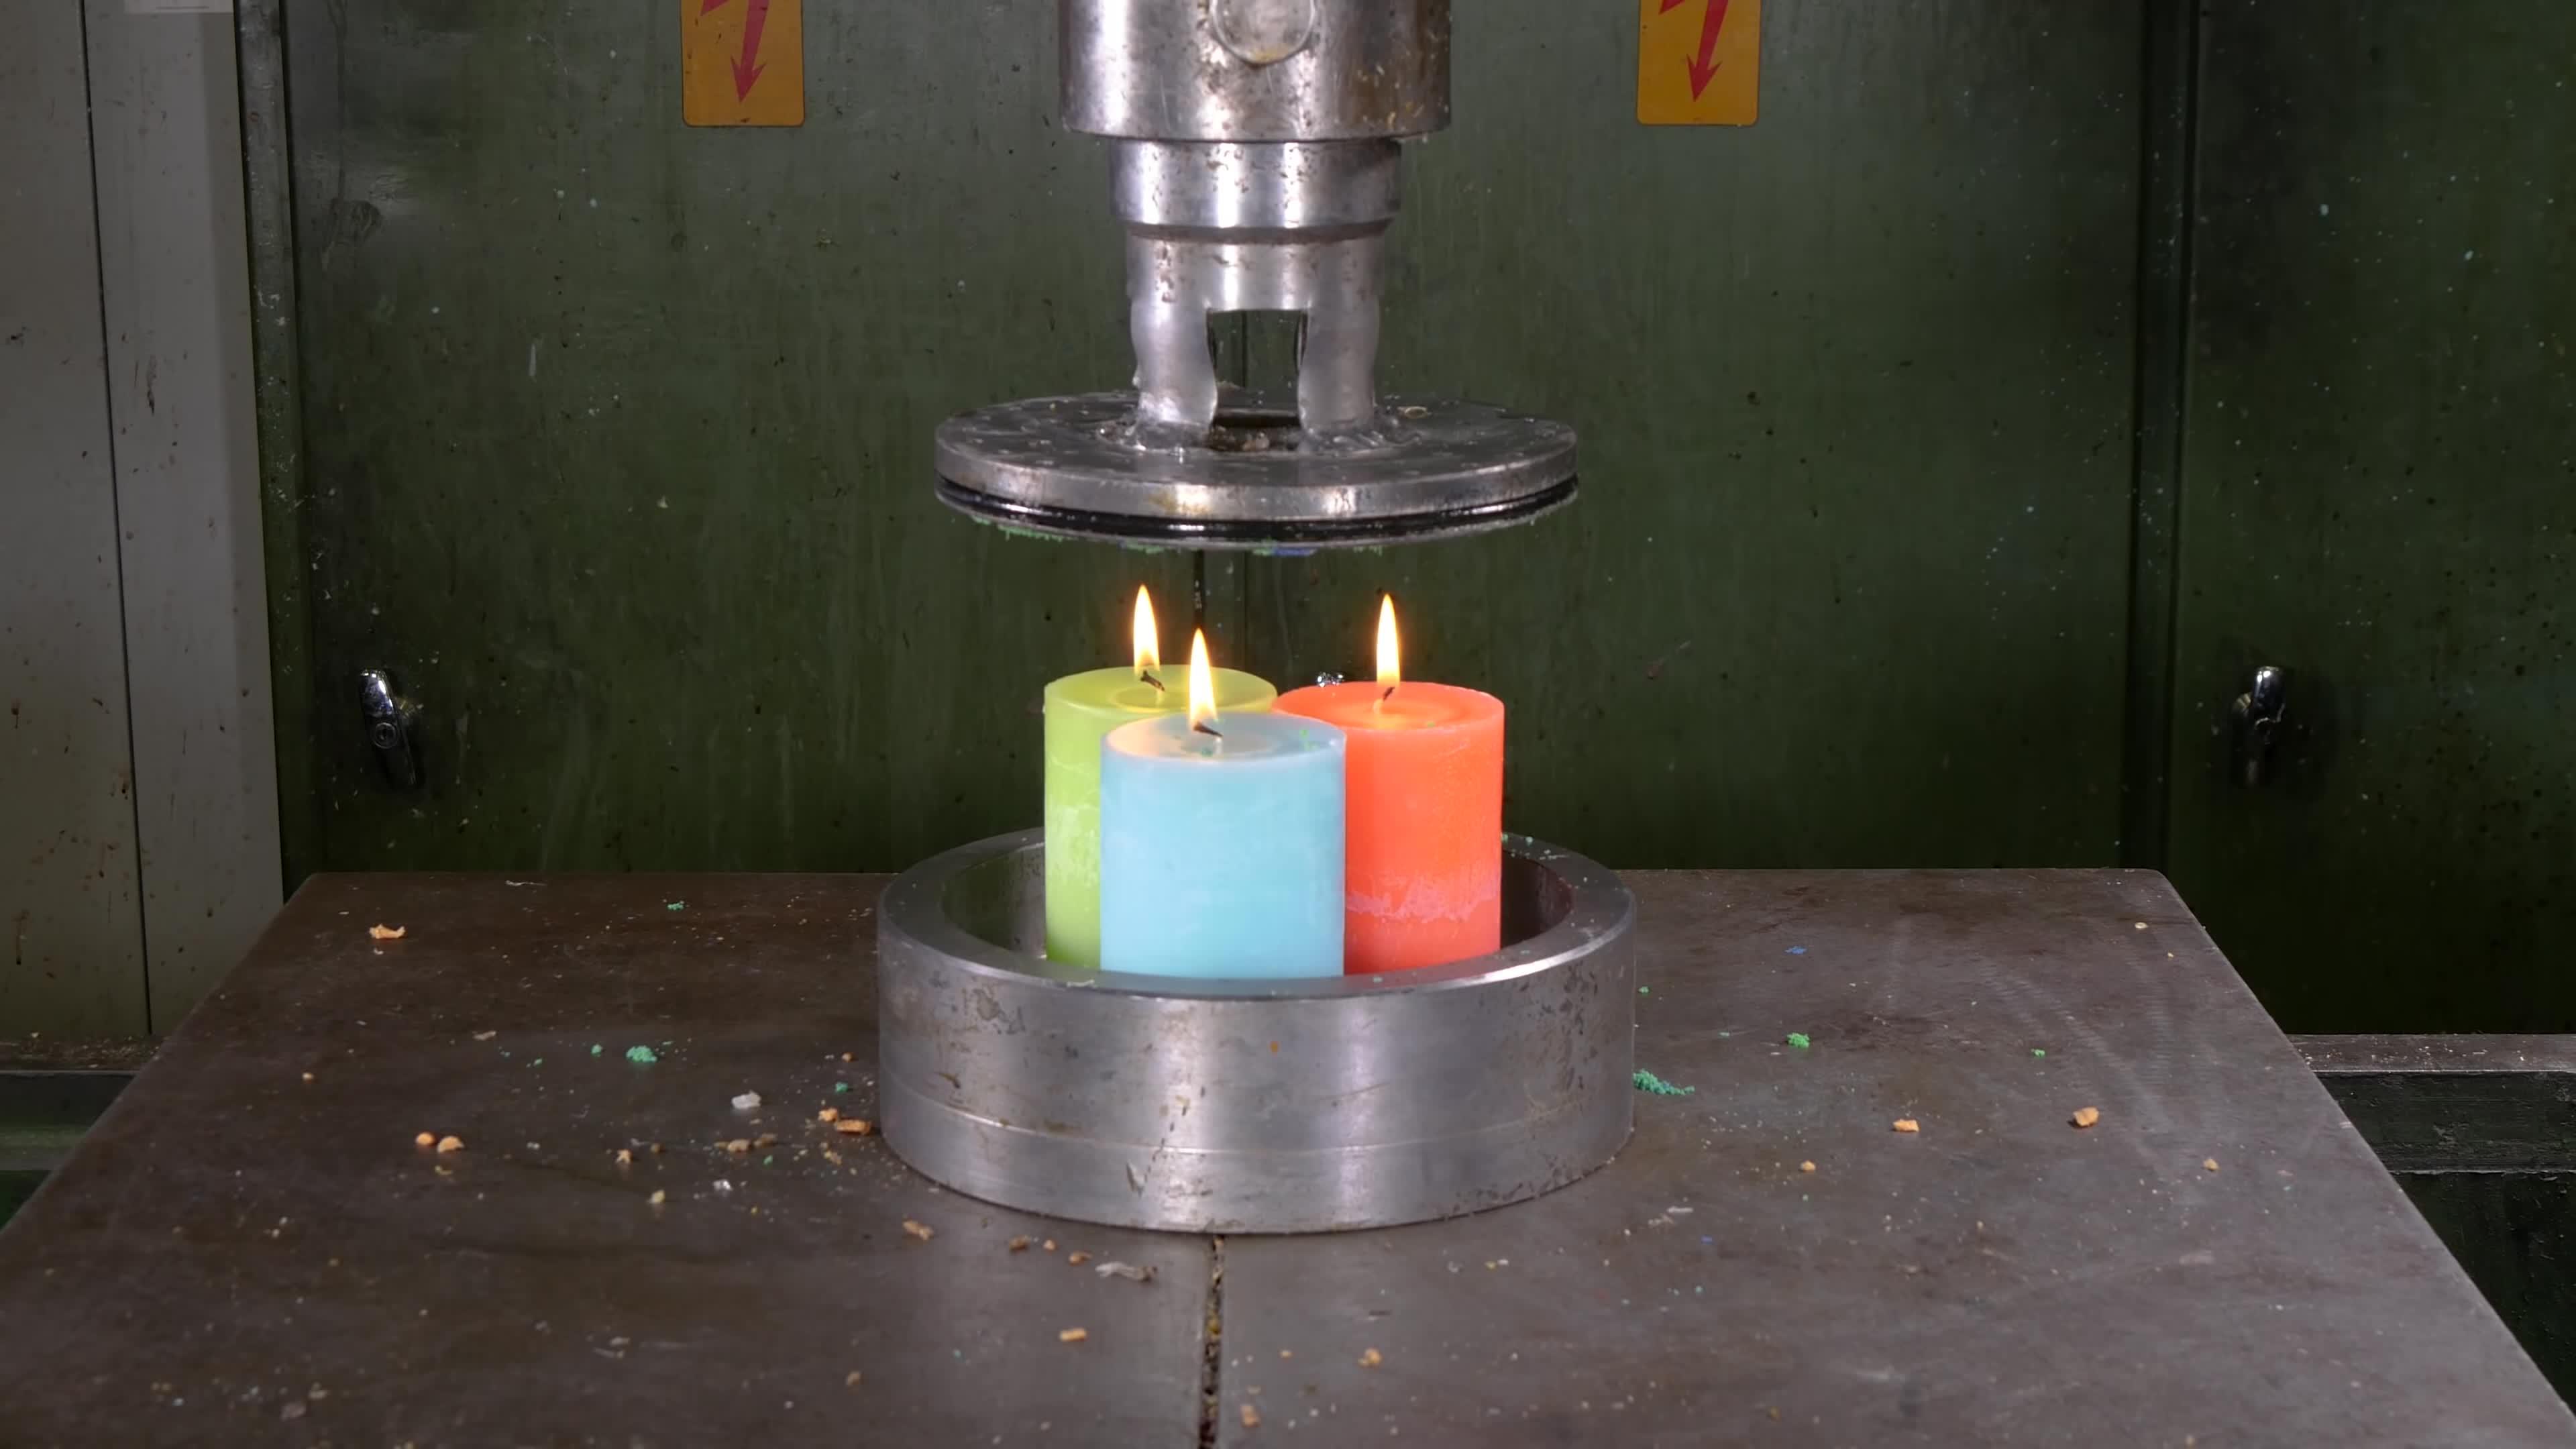 Hydraulic press channel, crush, destroy, hydraulic, hydraulic press, hydraulic press man, hydraulicpress, hydraulicpresschannel, press, willitcrush, Pressing Candles Through Small Holes with Hydraulic Press | in 4K GIFs